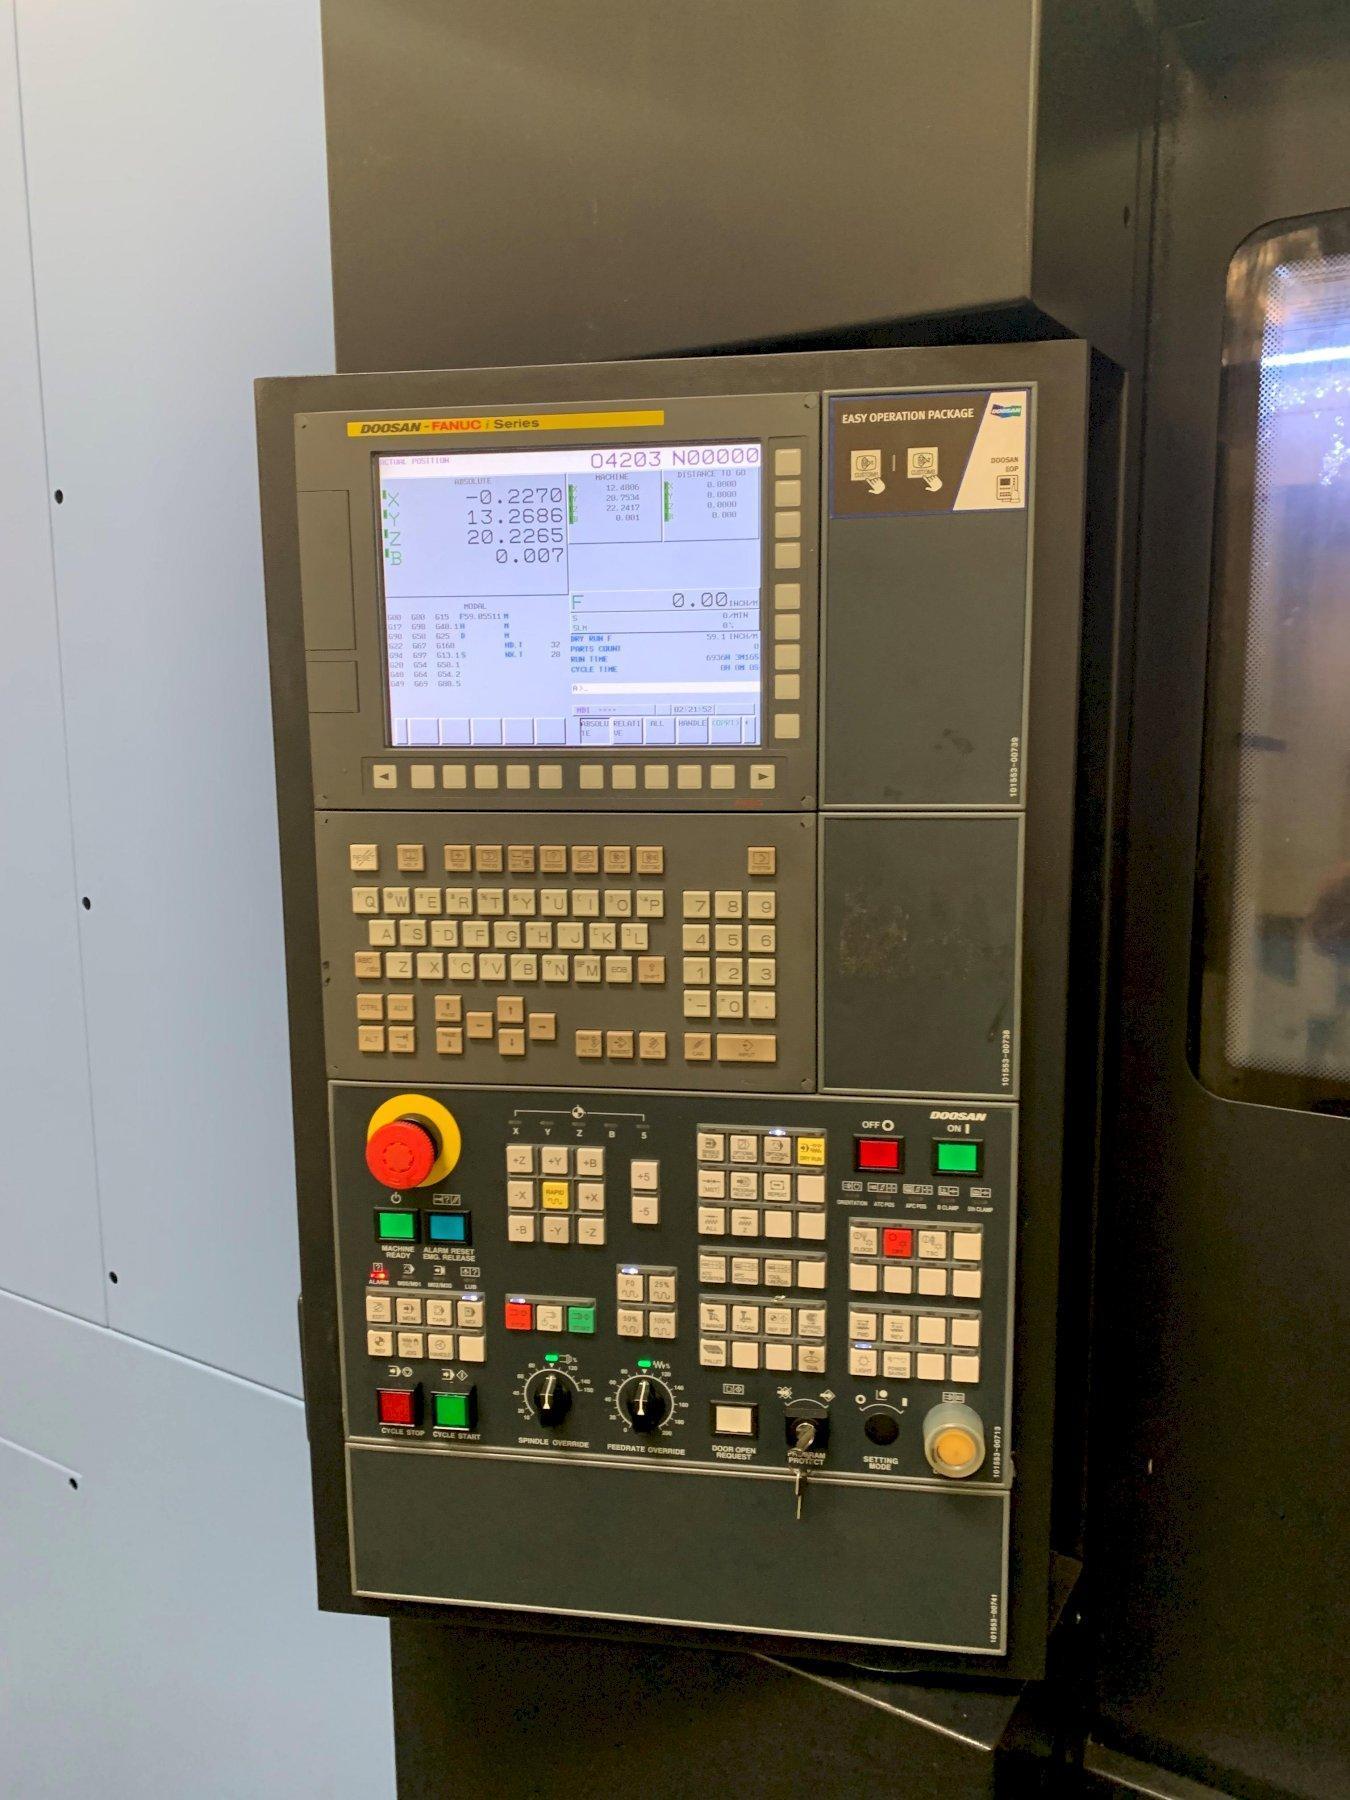 Doosan HC-400II HMC 2017 with: Fanuc Control, Full 4th Axis, Tool Presetter, Big Plus CT40 Taper, 12k RPM, 60-ATC, TSC, and Chip Conveyor.